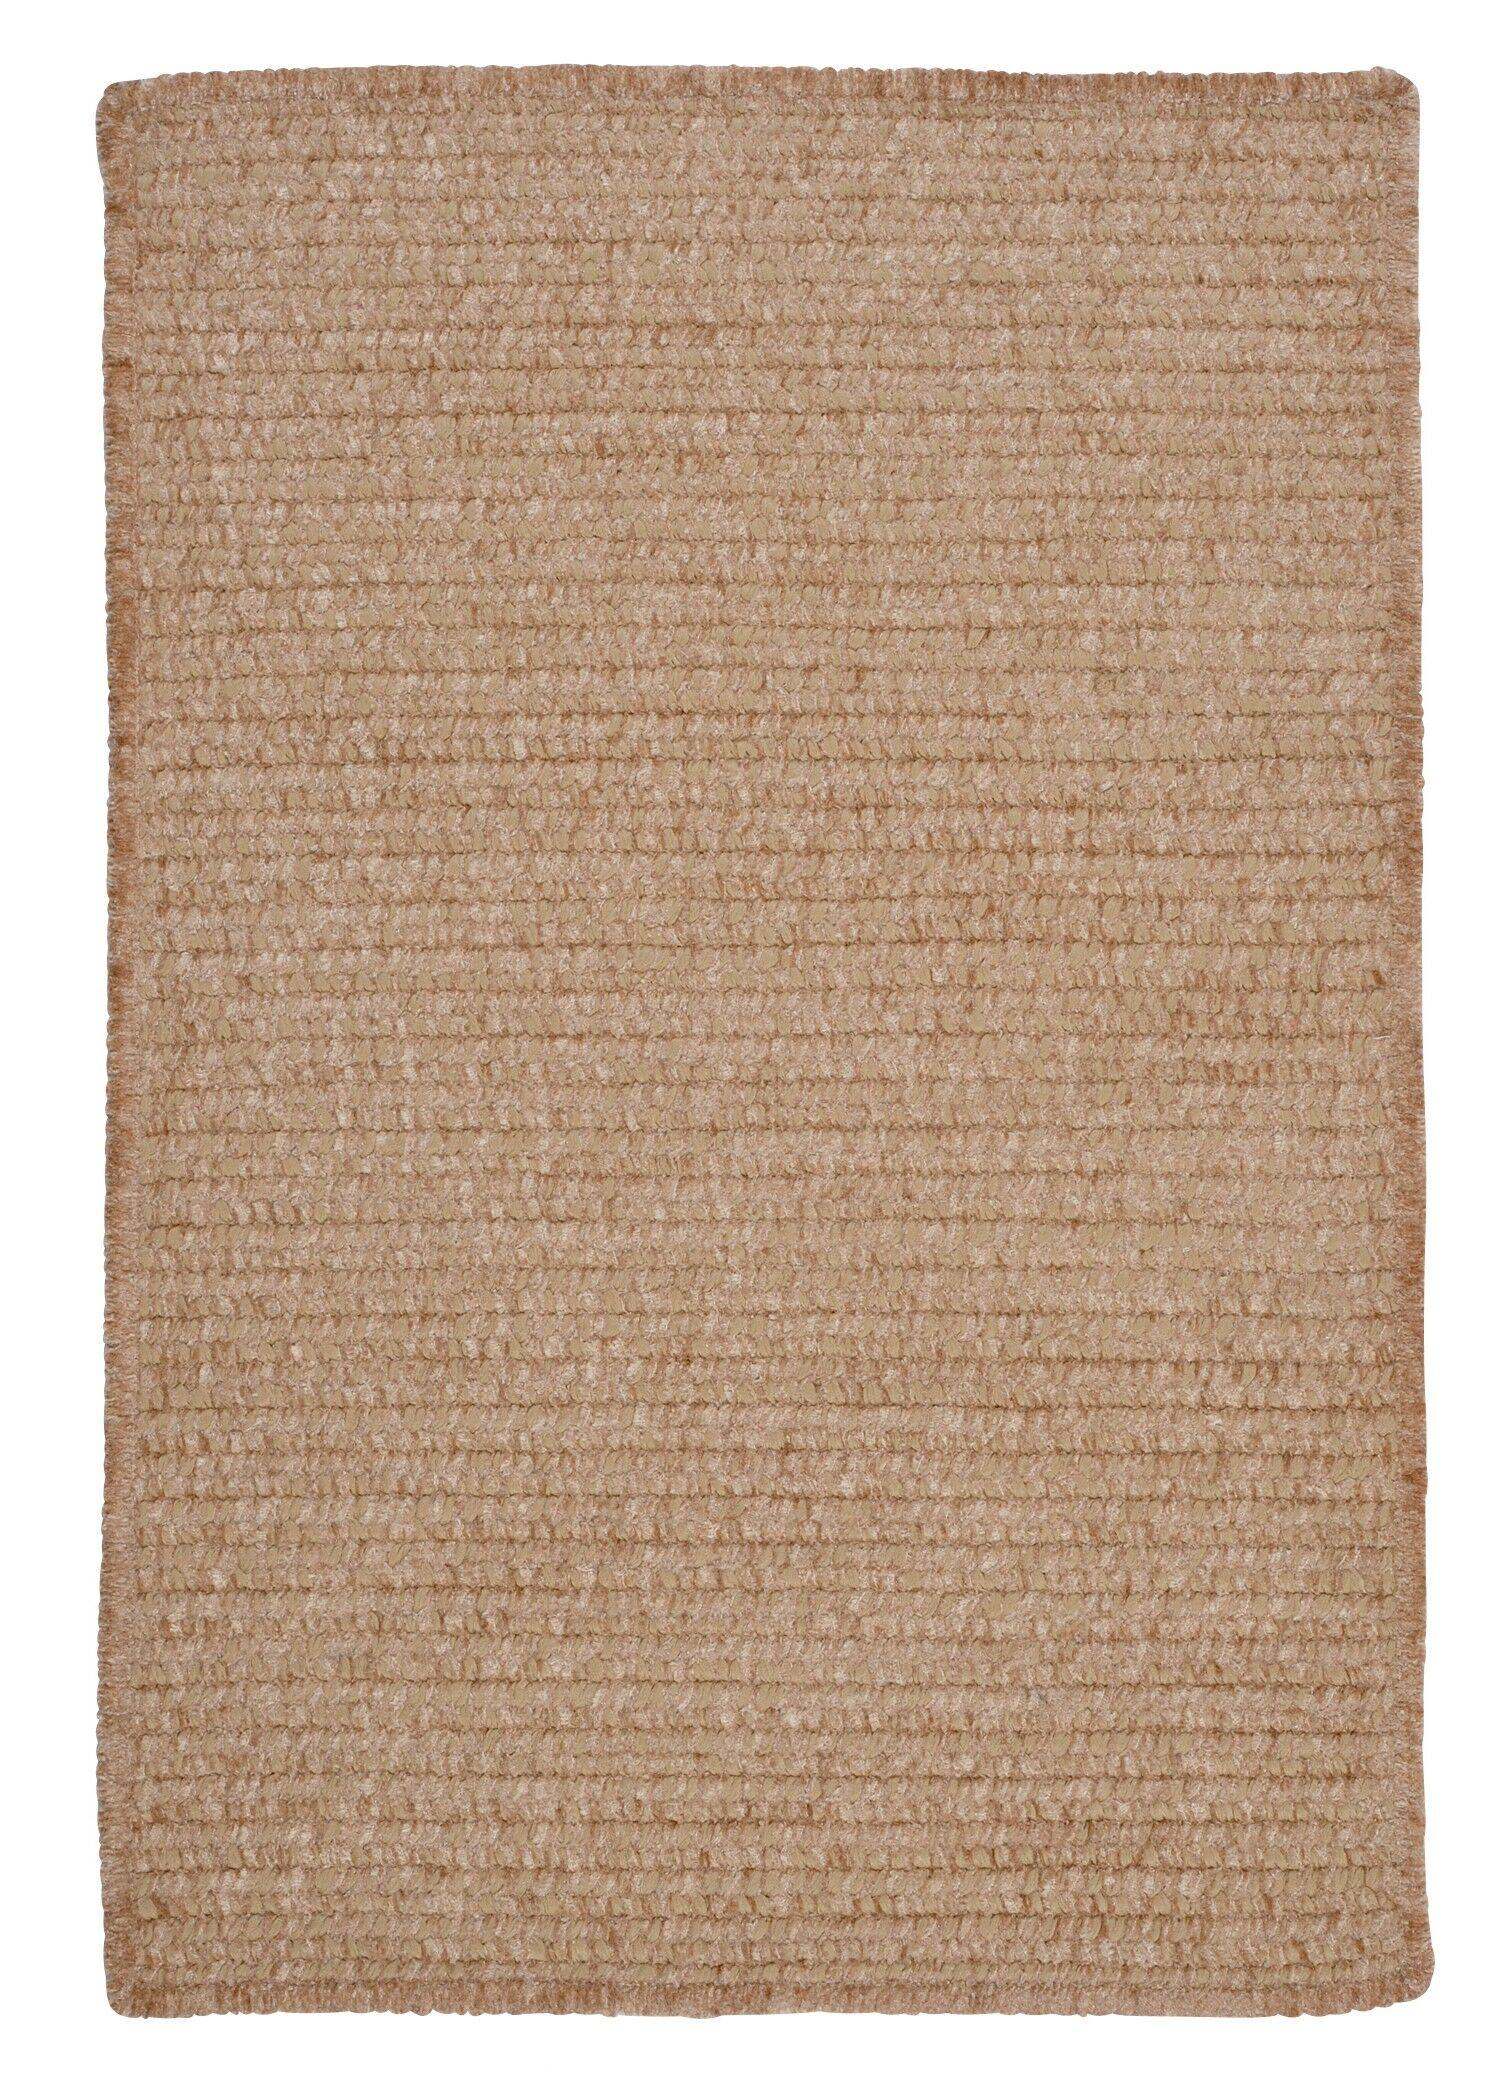 Gibbons Sand Bar Indoor/Outdoor Area Rug Rug Size: Runner 2' x 8'